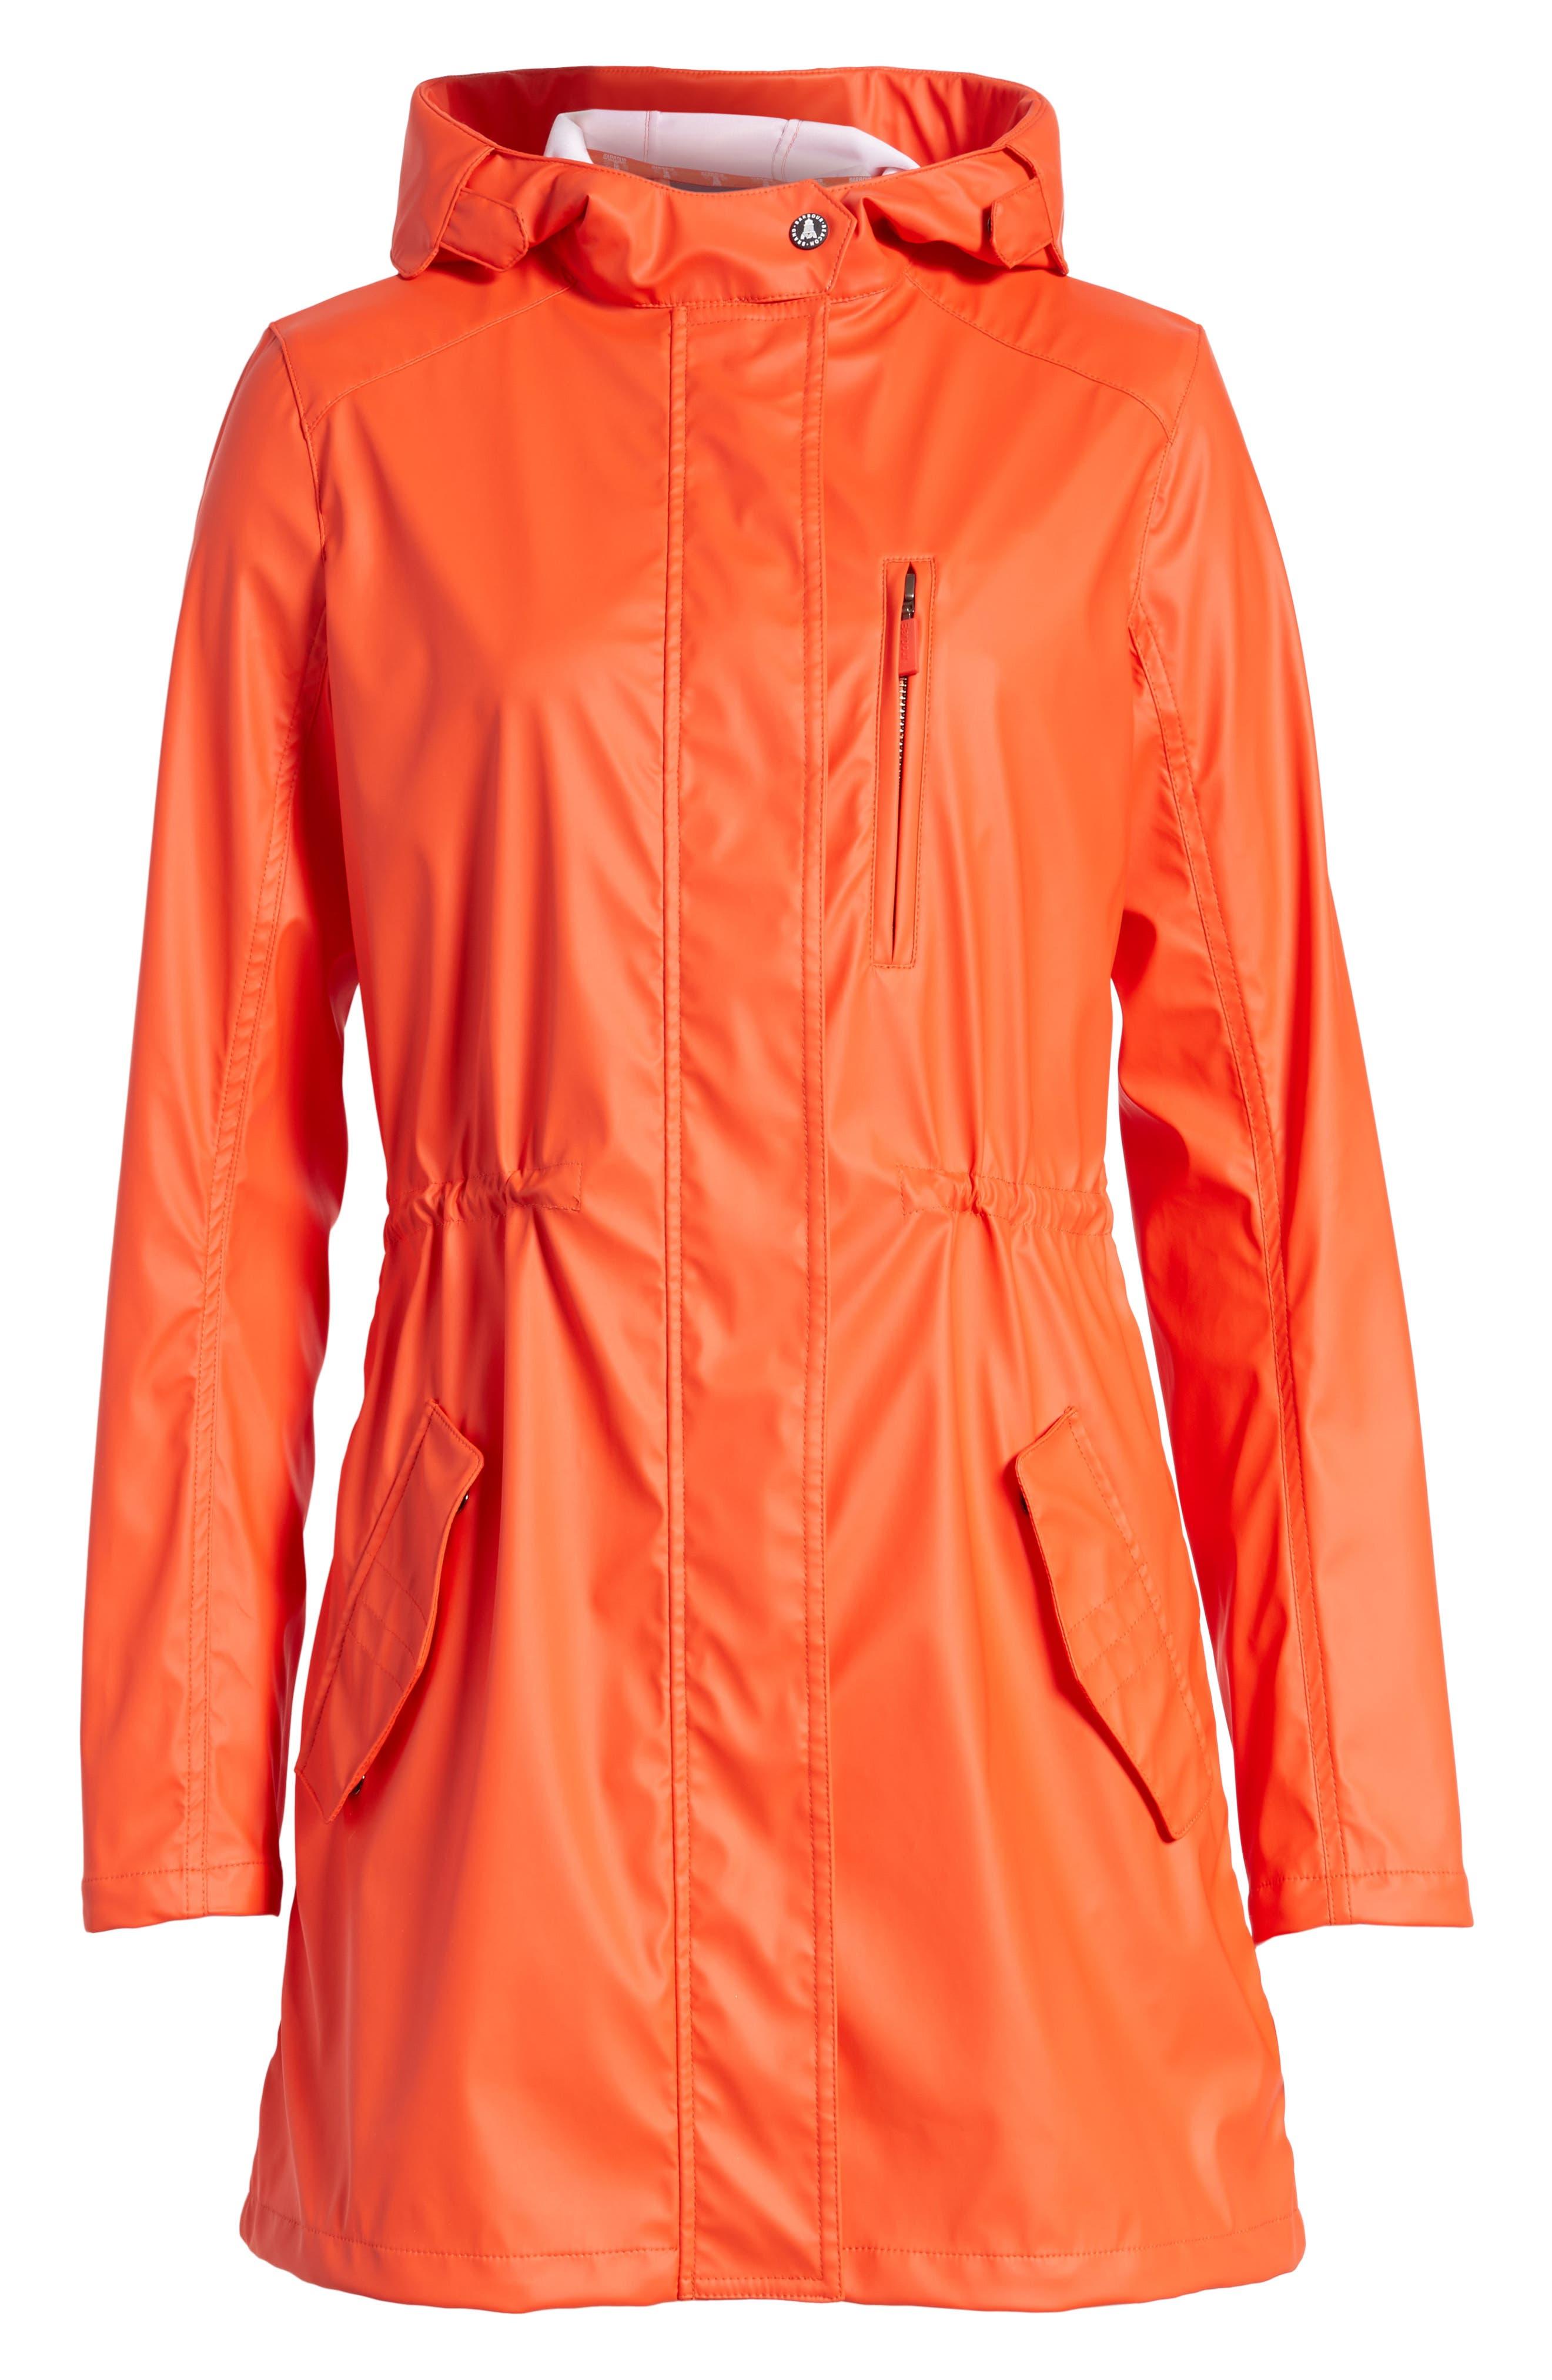 Harbour Hooded Jacket,                             Alternate thumbnail 6, color,                             Signal Orange